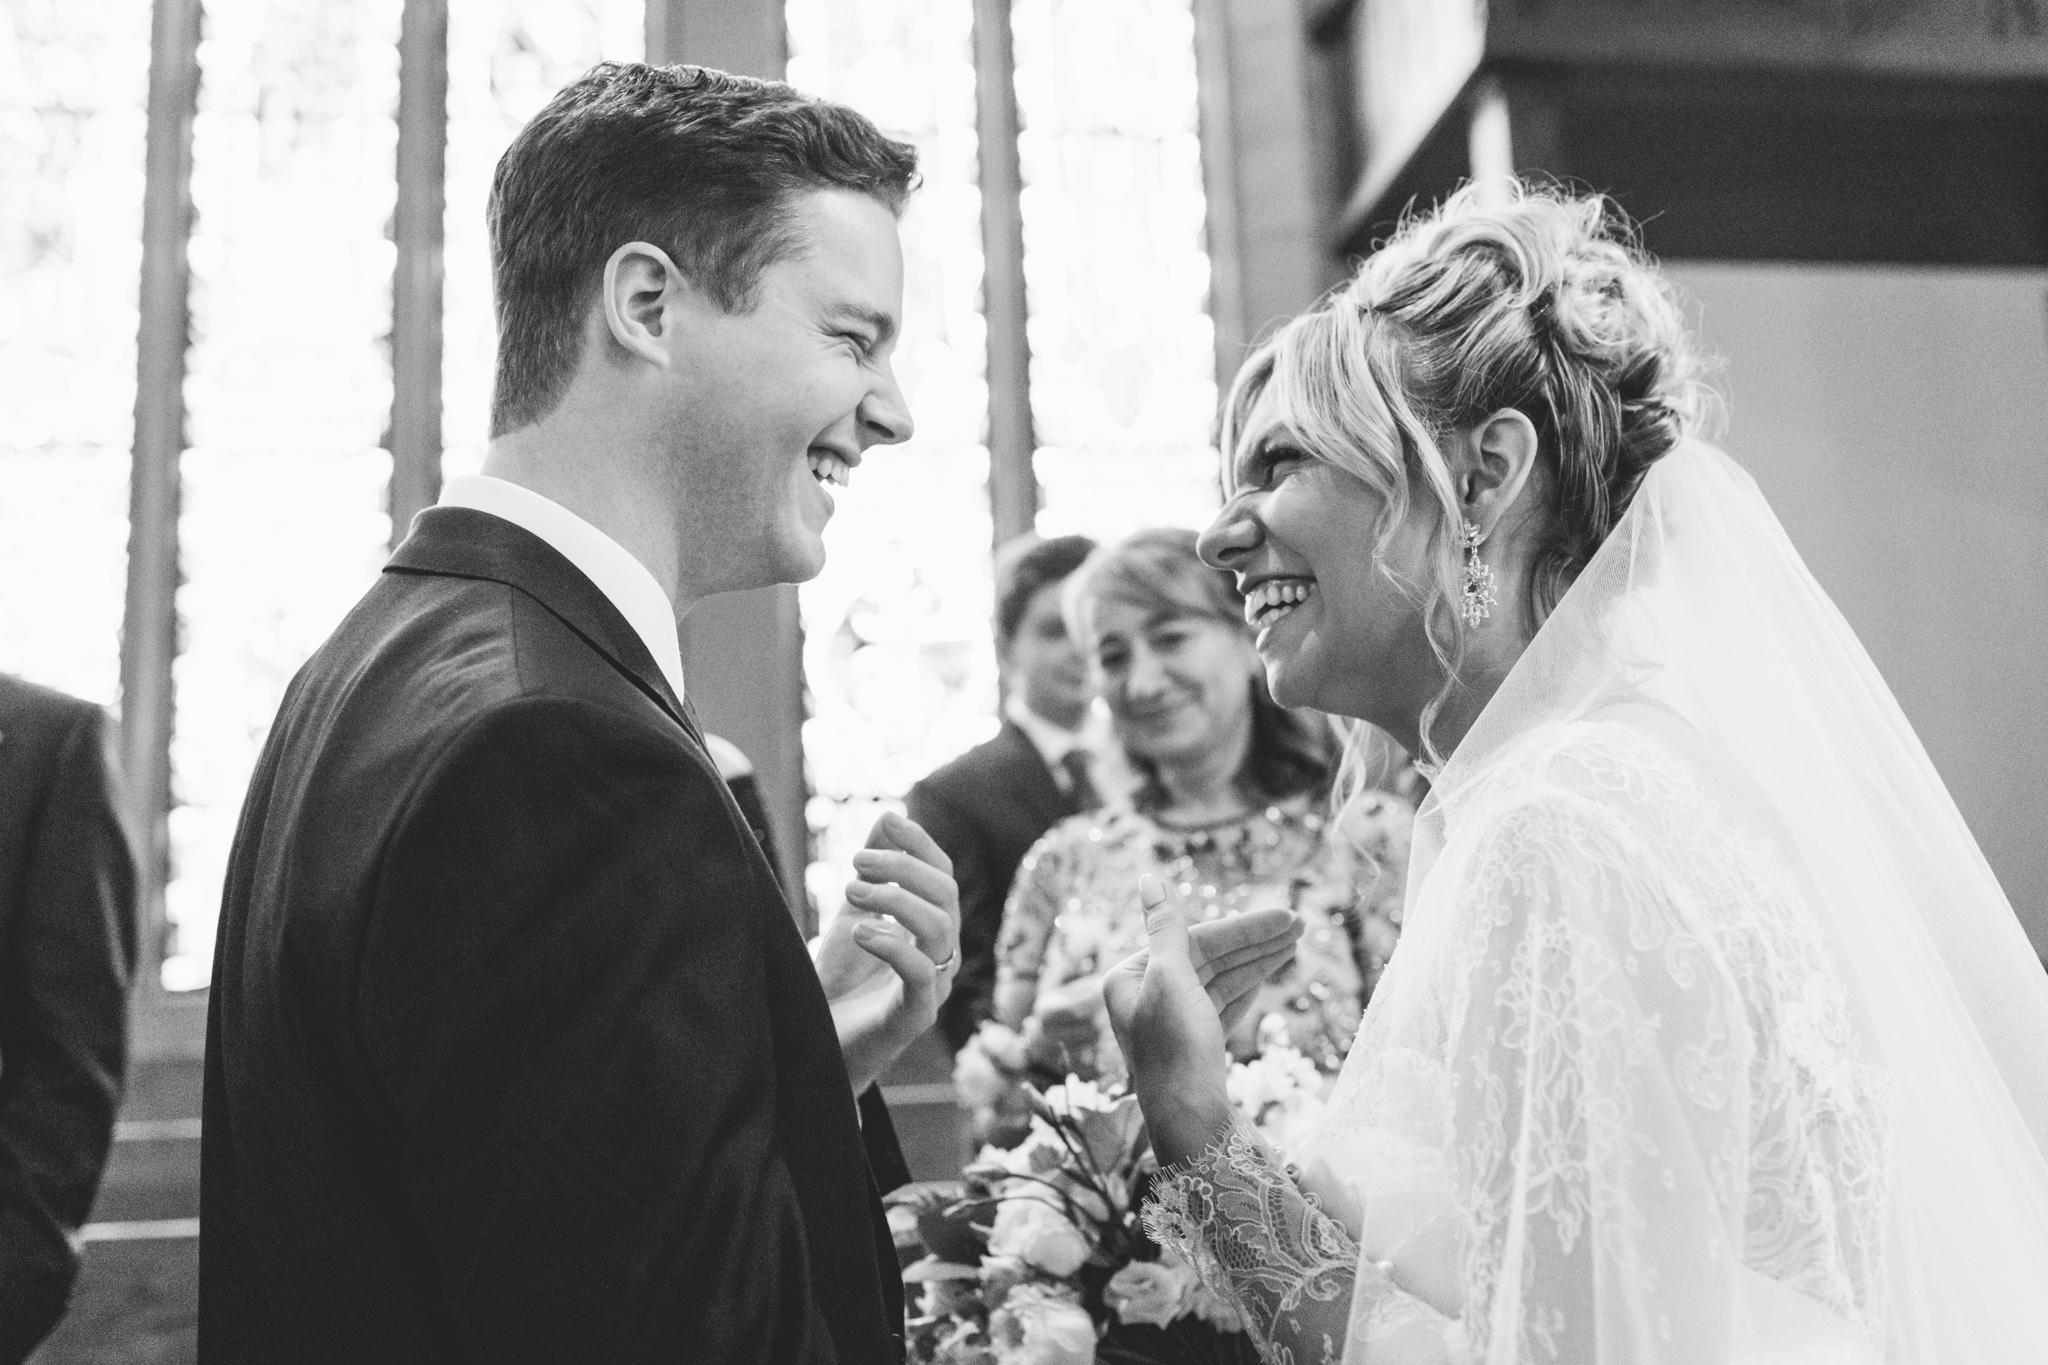 2018jennichandlerphotography_brevardnc_krisandfieldwedding_WEB-235.jpg